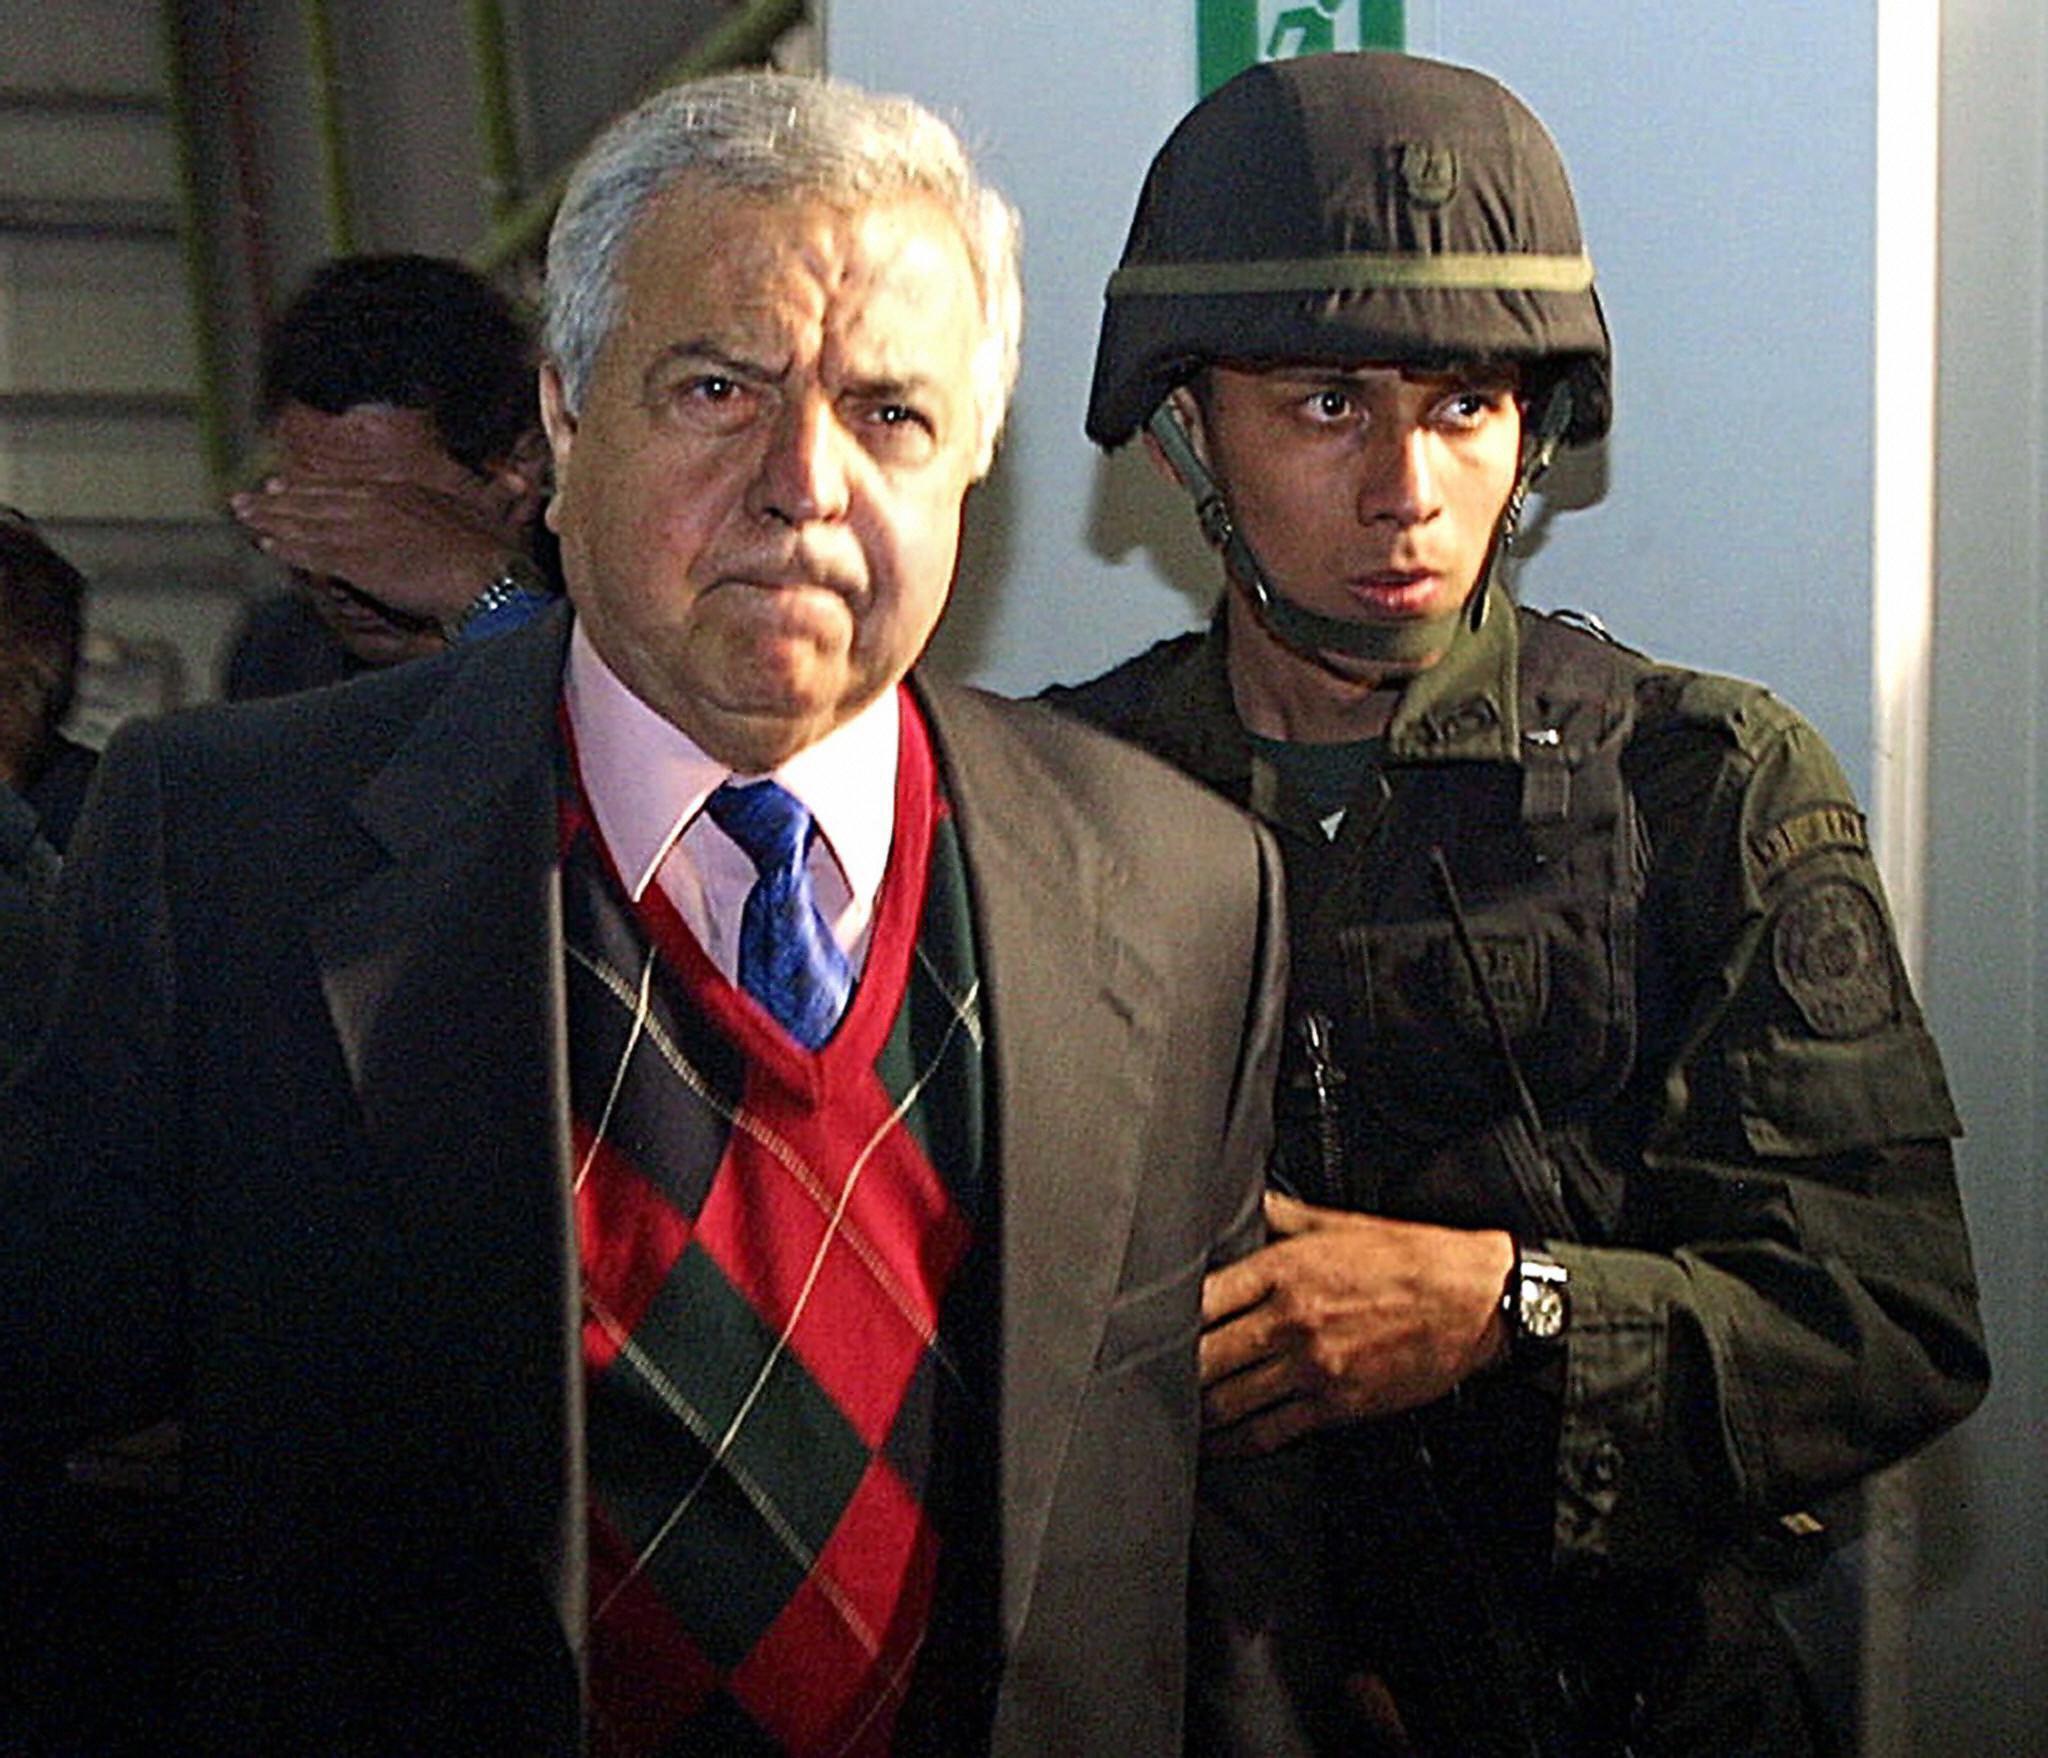 Gilberto Rodriguez Orejuela, 63, a leader of the Cali drug cartel